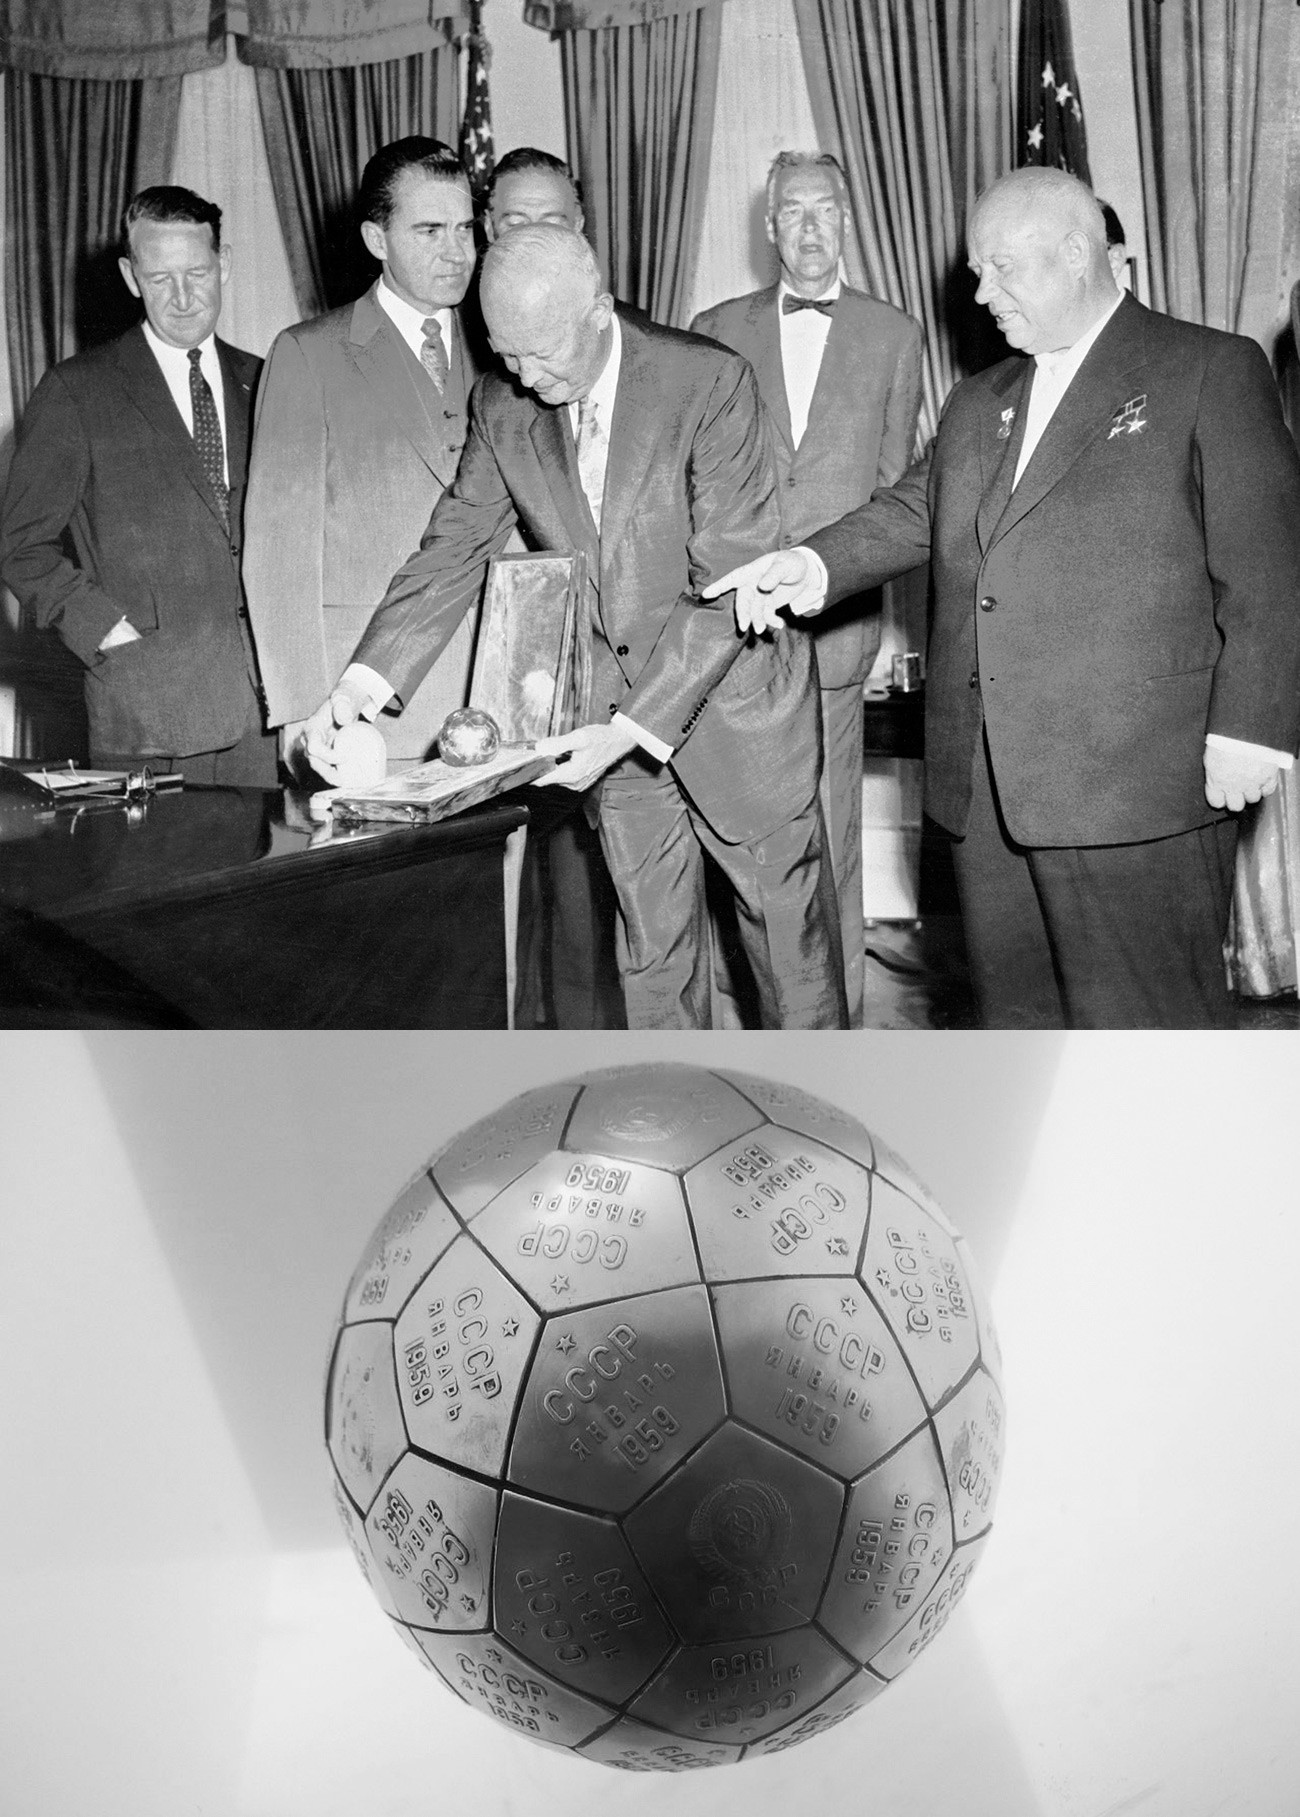 Vice-presidente dos EUA, Richard Nixon (2º à esq) e presidente dos EUA, Dwight Eisenhower (esq), observam miniatura da Lúnik, dada de presente pelo líder soviético Nikita Khruschov (dir) durante visita a Washington, 1959